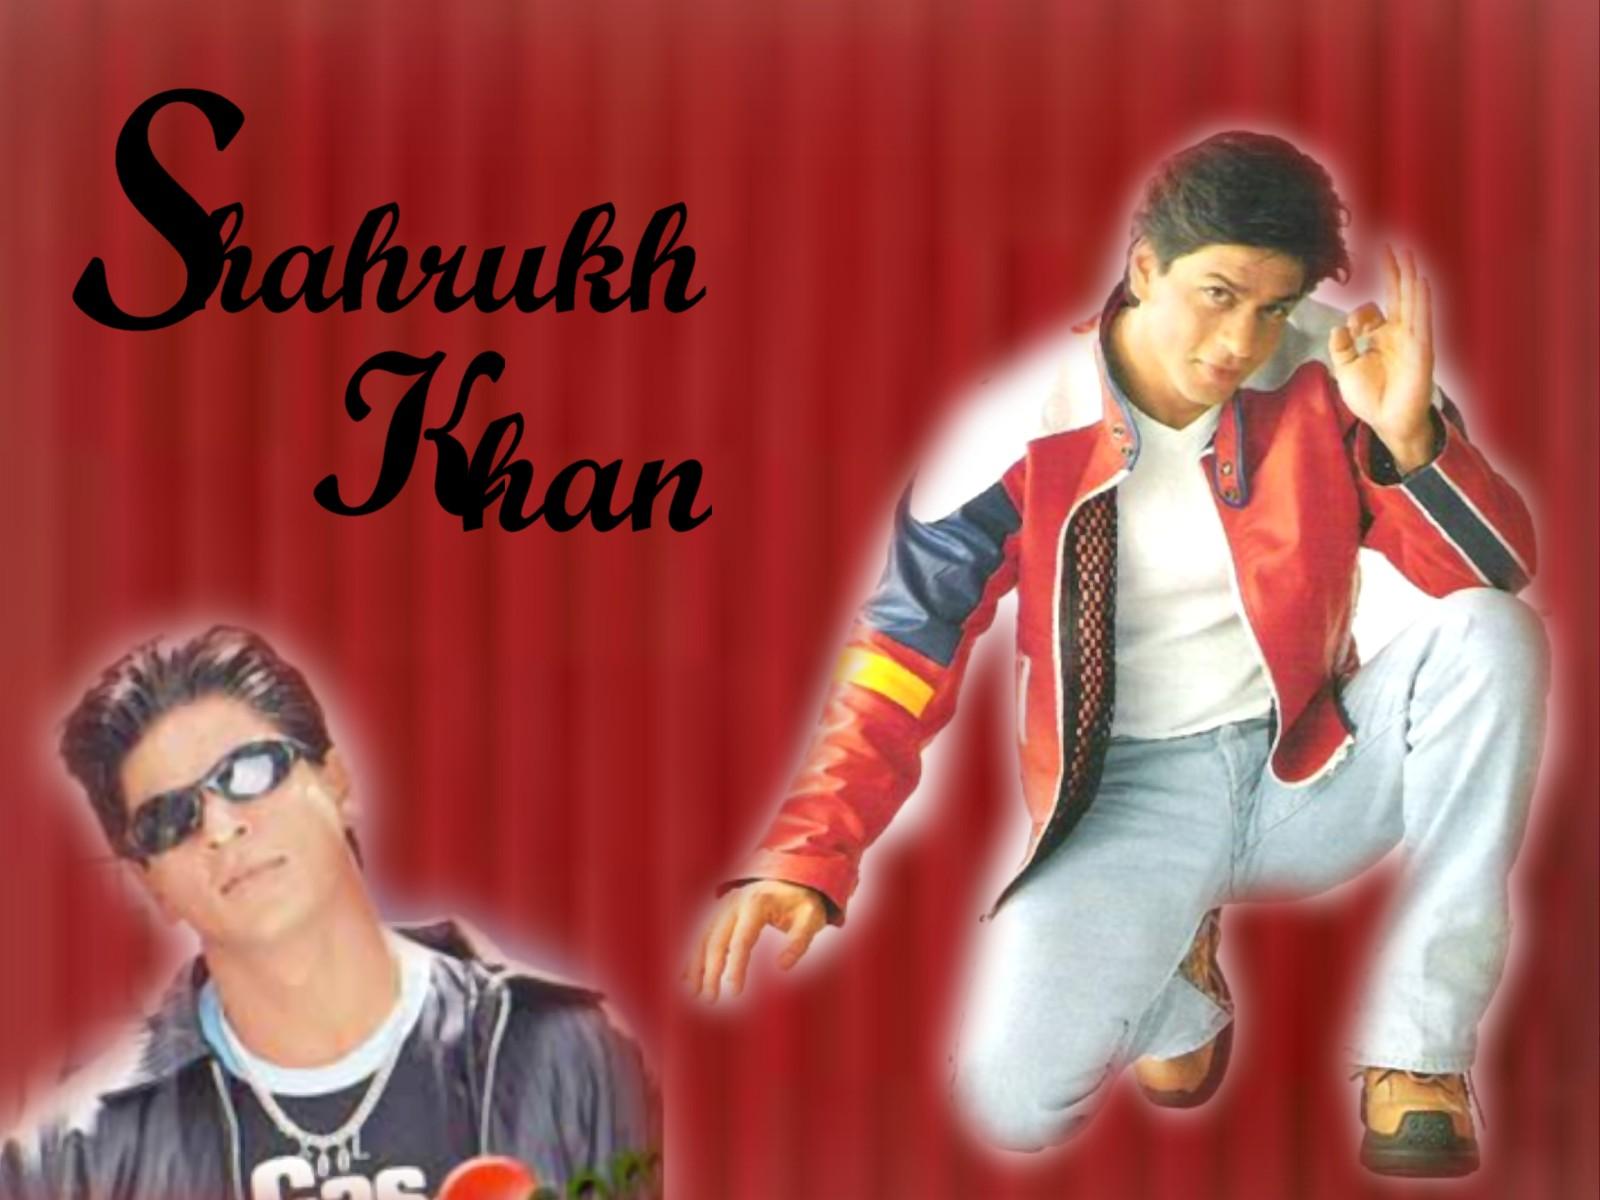 Shahrukh Khan Live Wallpaper: Srk Wallpapers In Ddlj